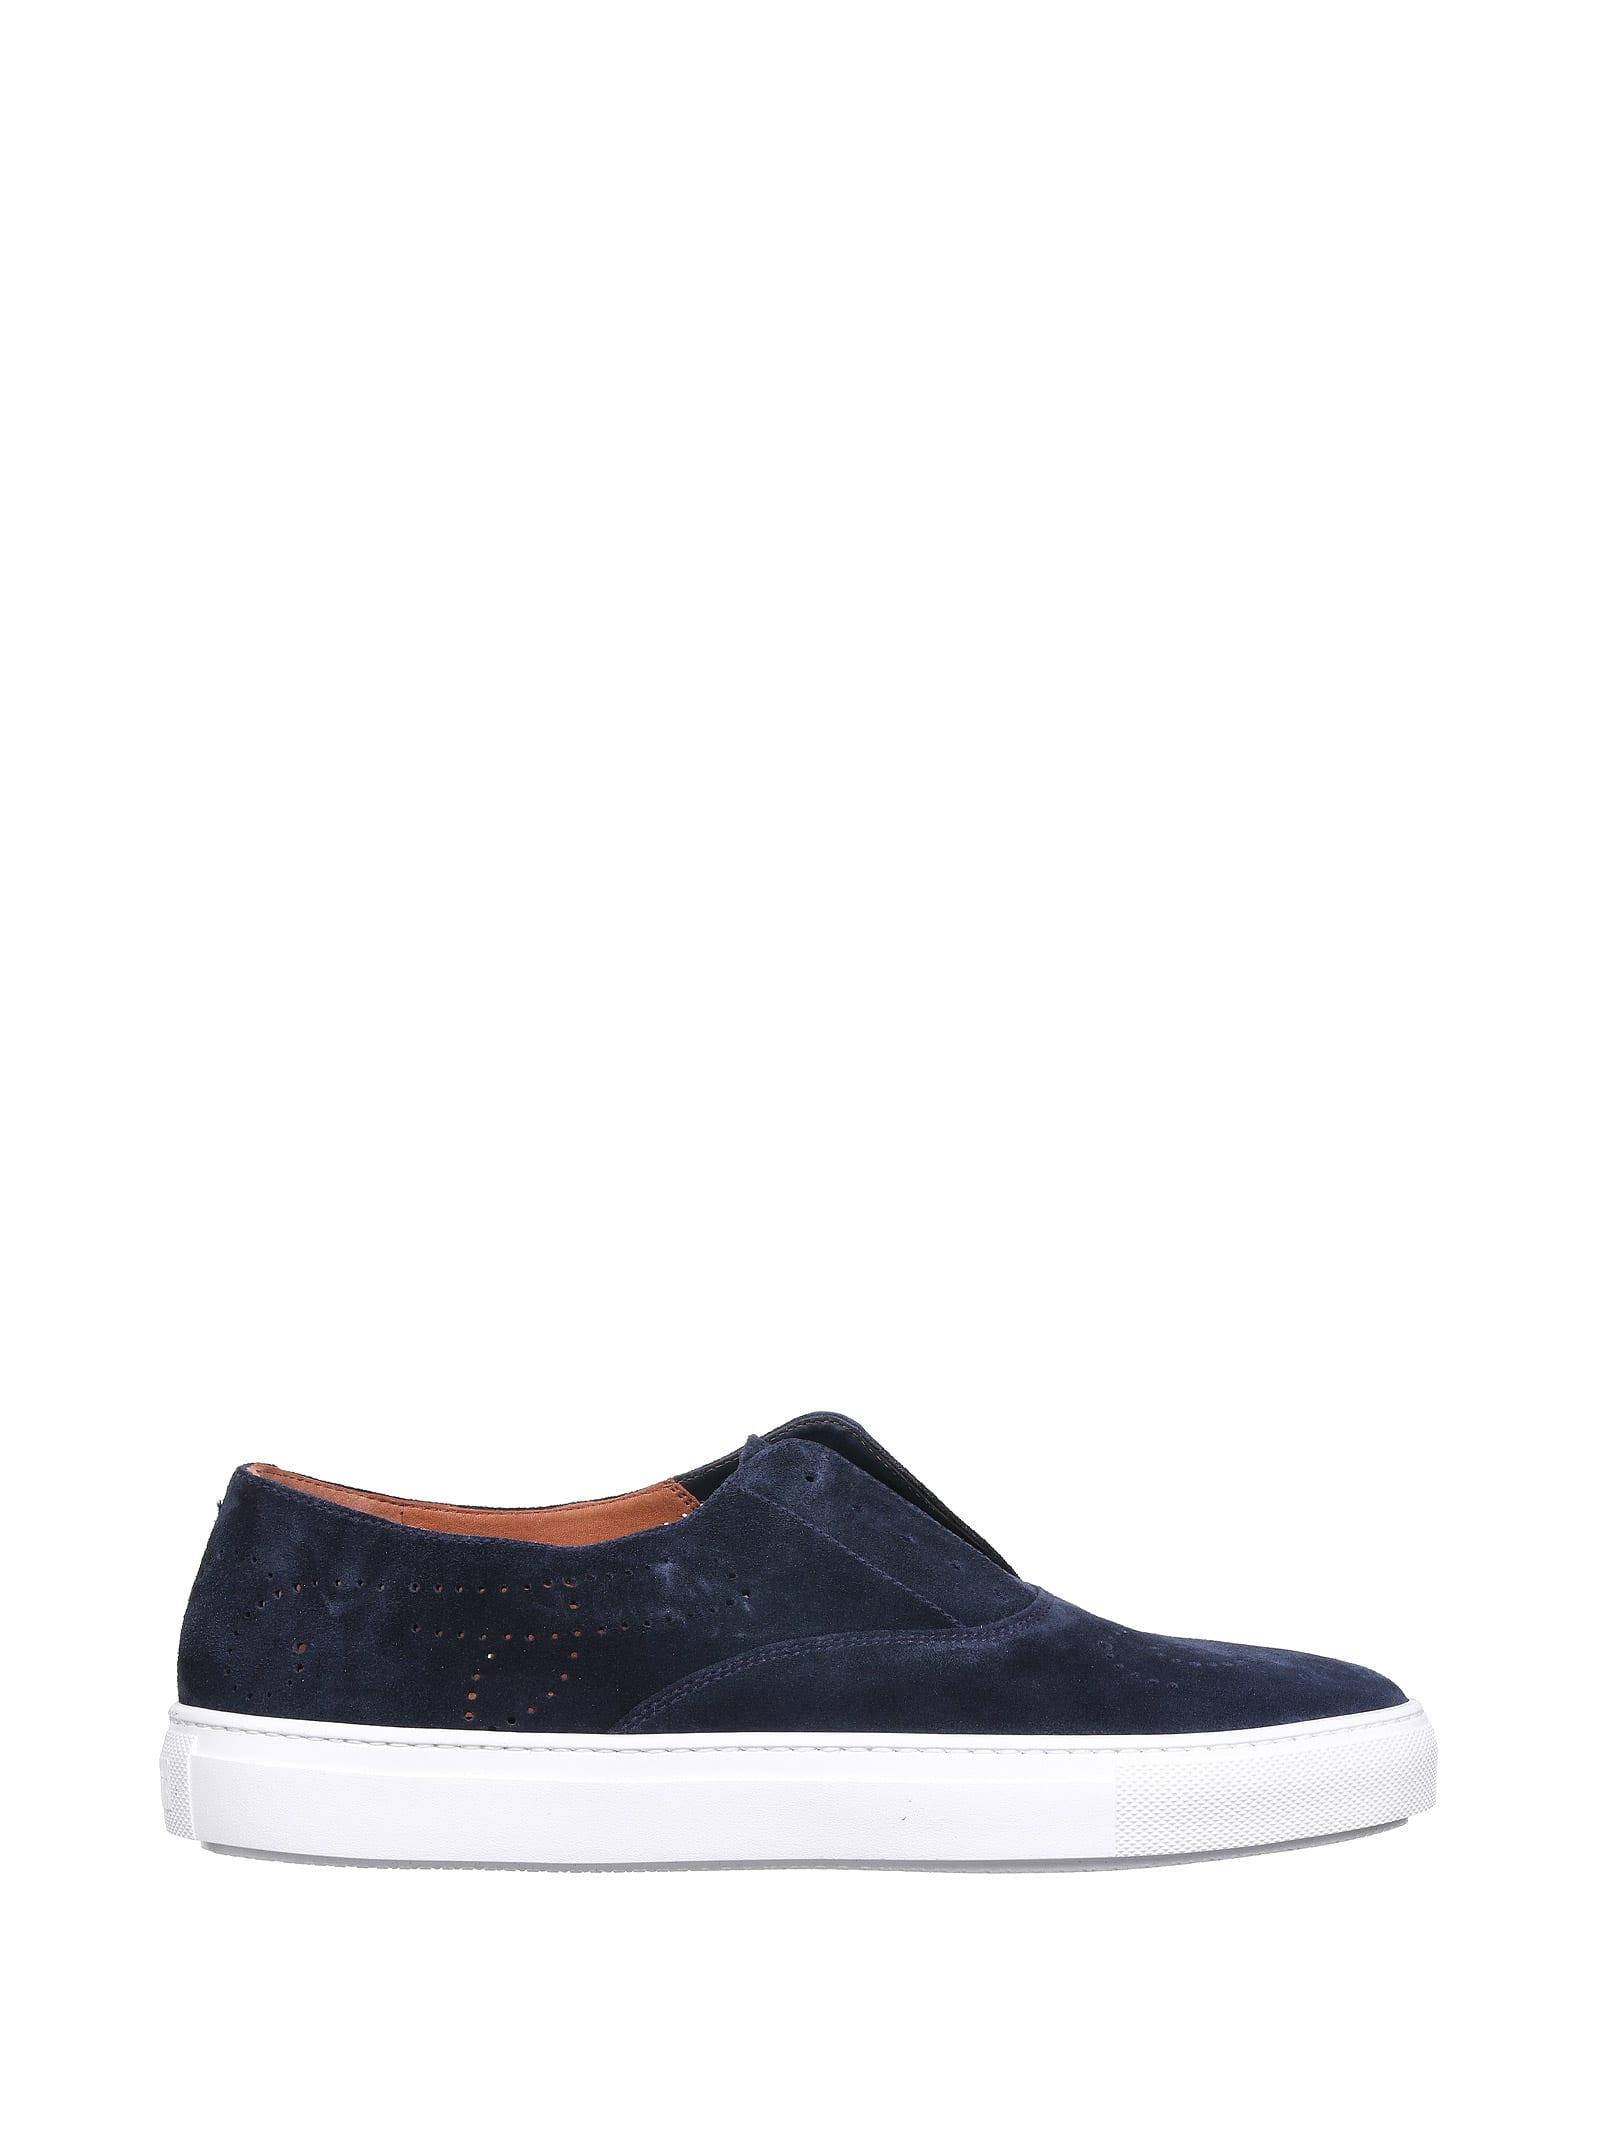 Fratelli Rossetti Blue Sneakers